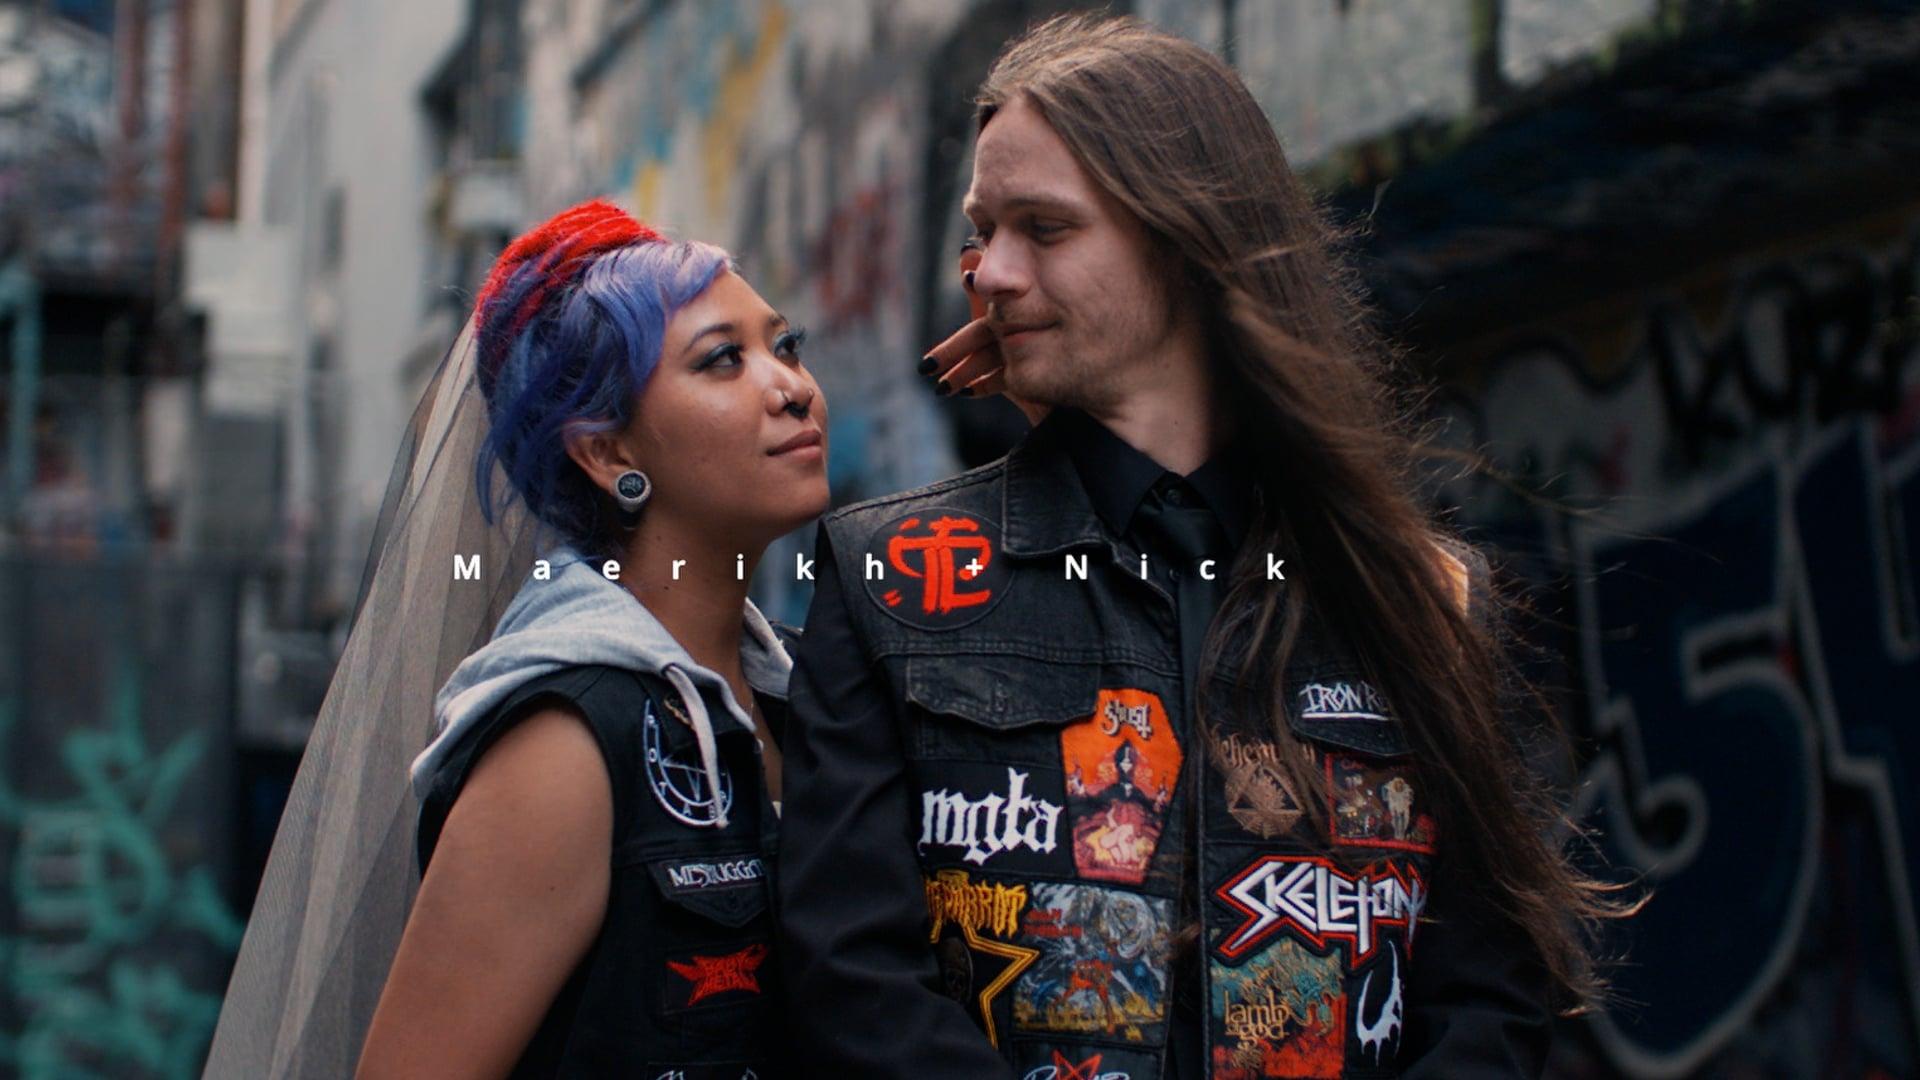 Maerikh + Nick